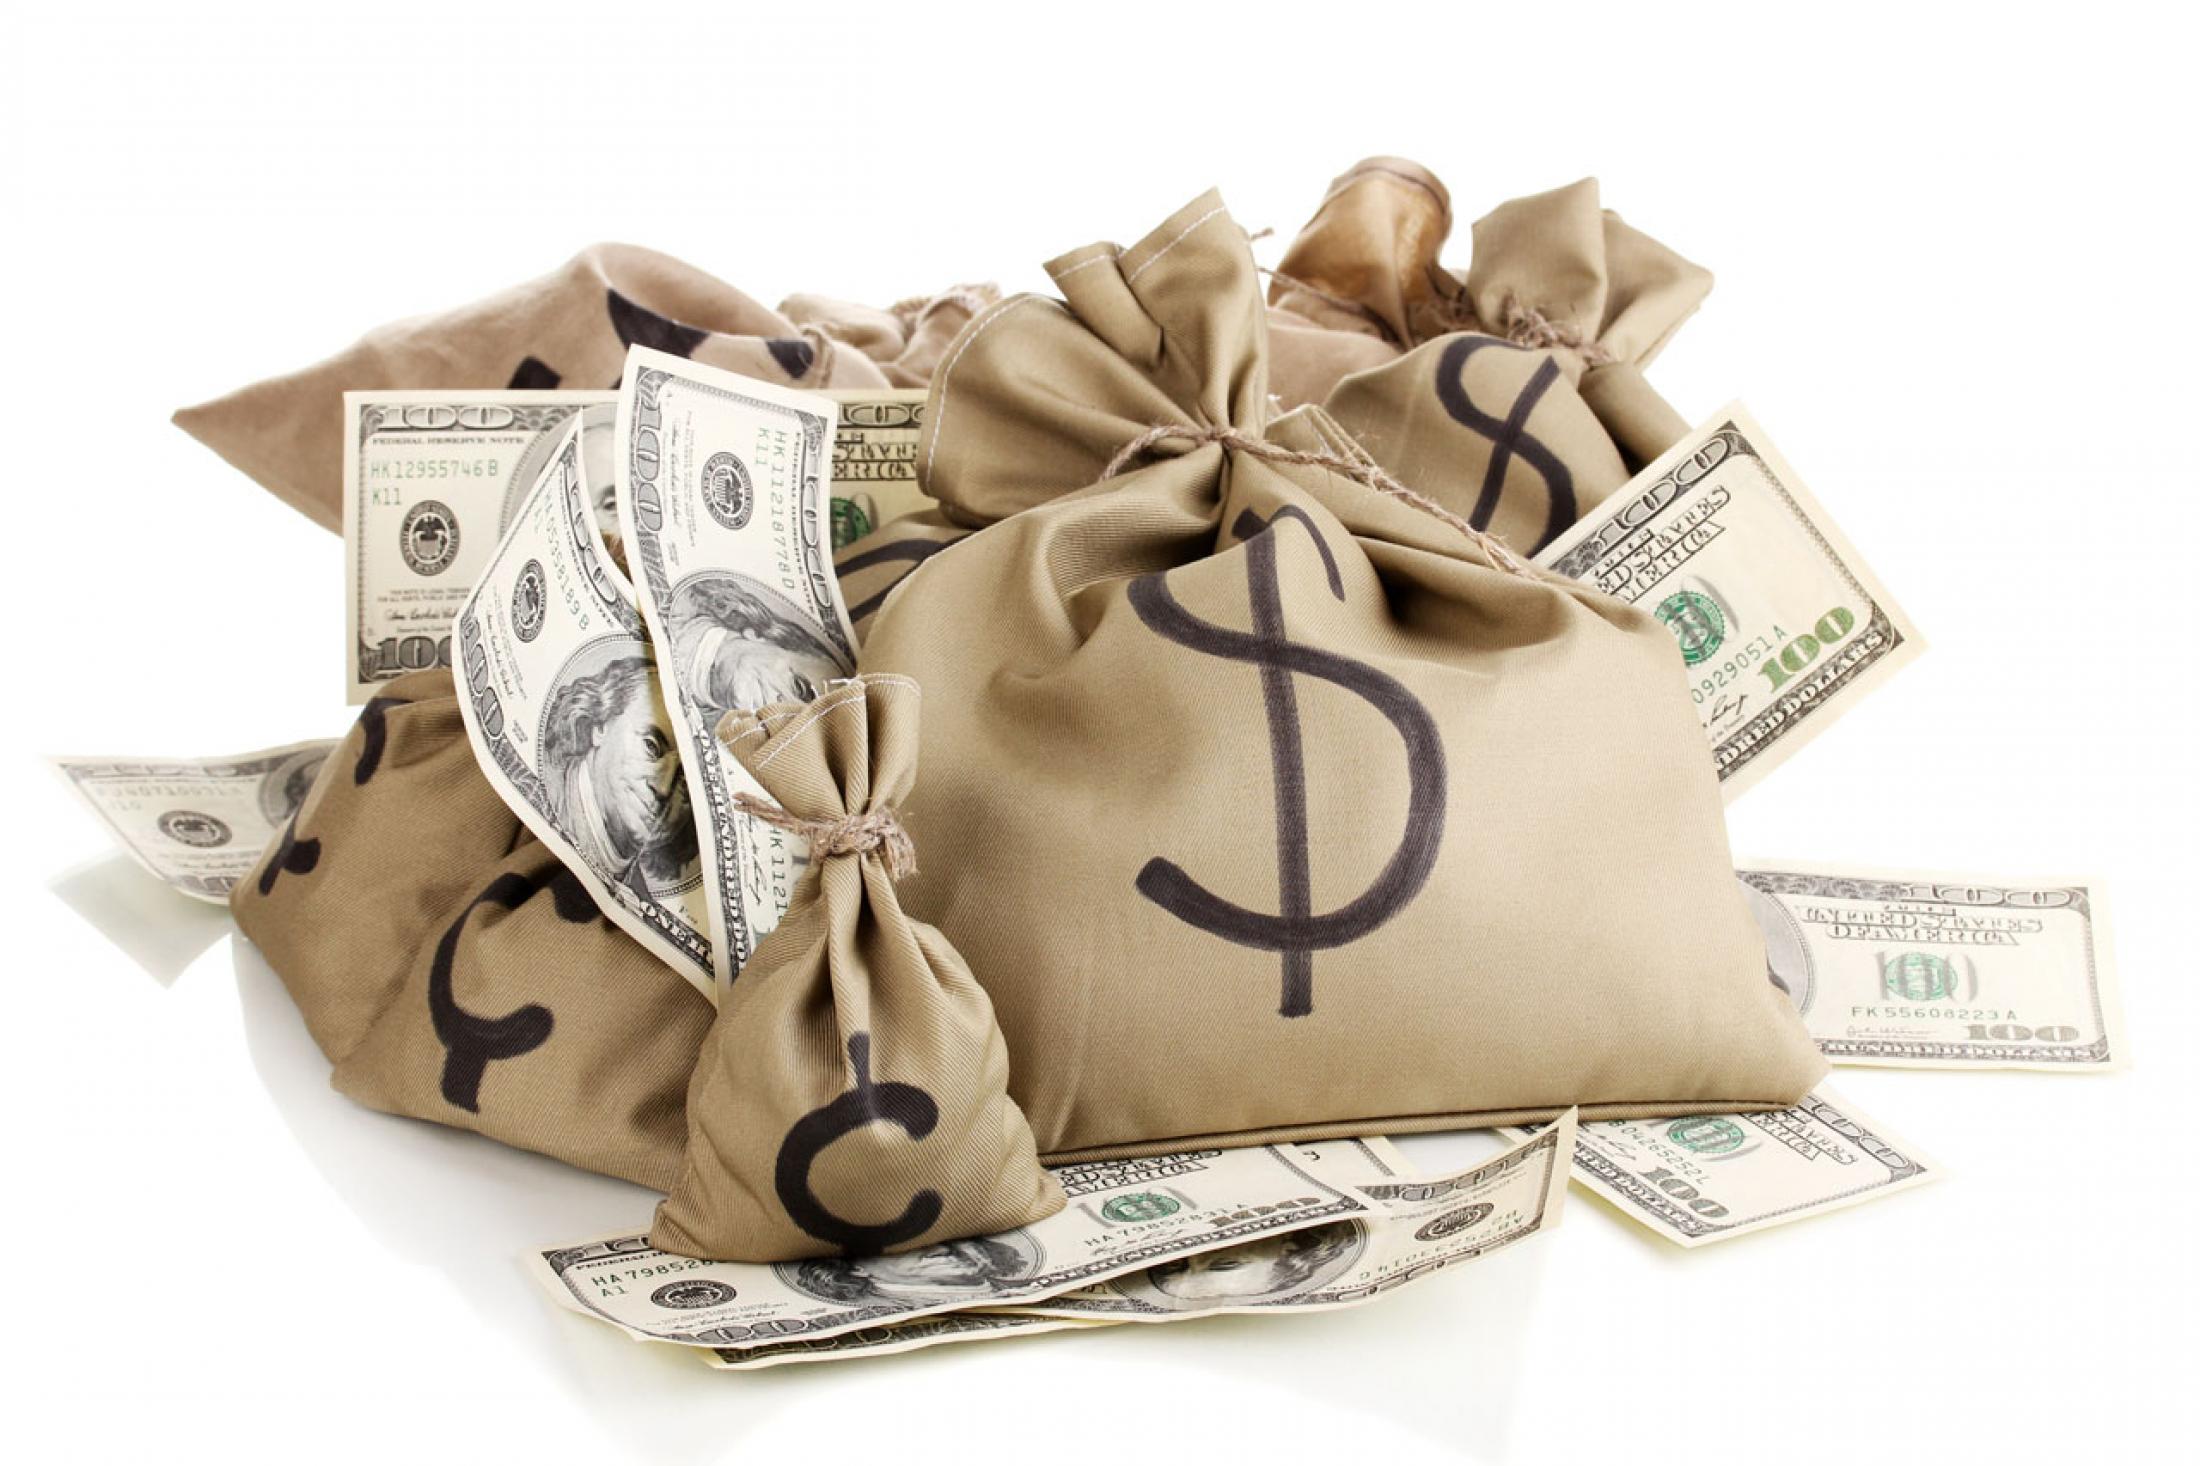 bags-of-moneyx1280 jpg